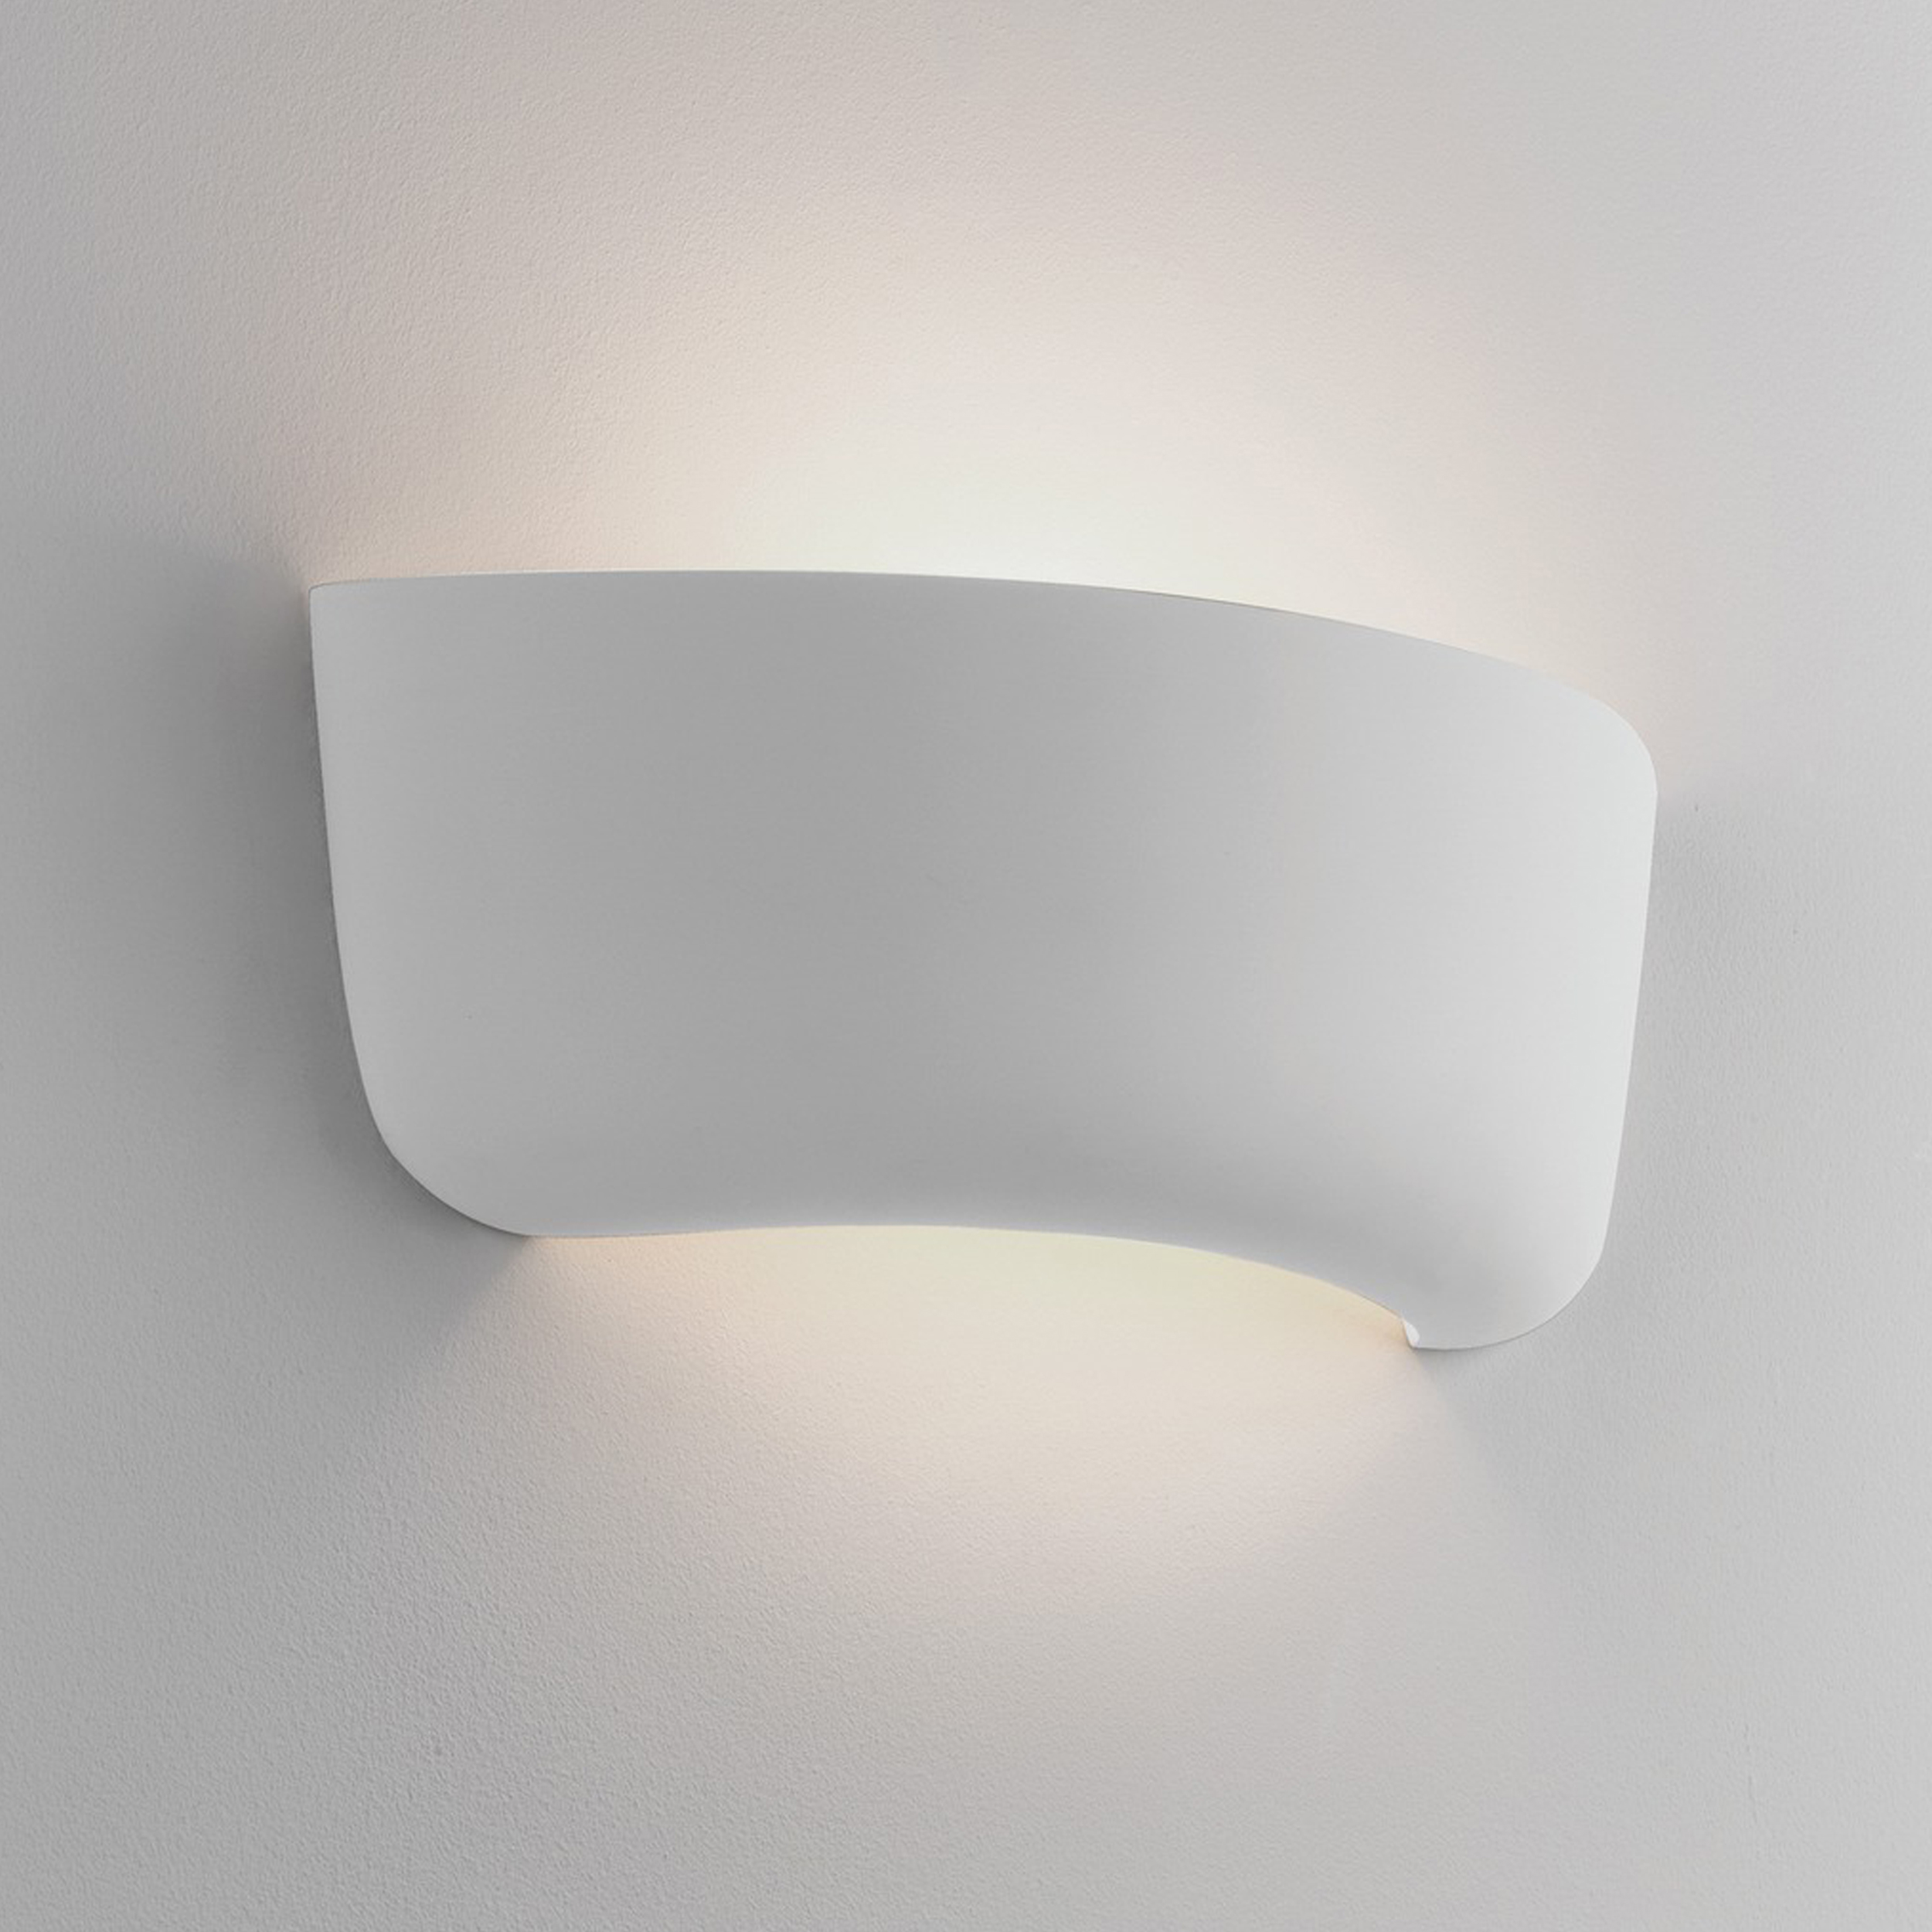 Astro Gosford 340 Wall Light Ceramic